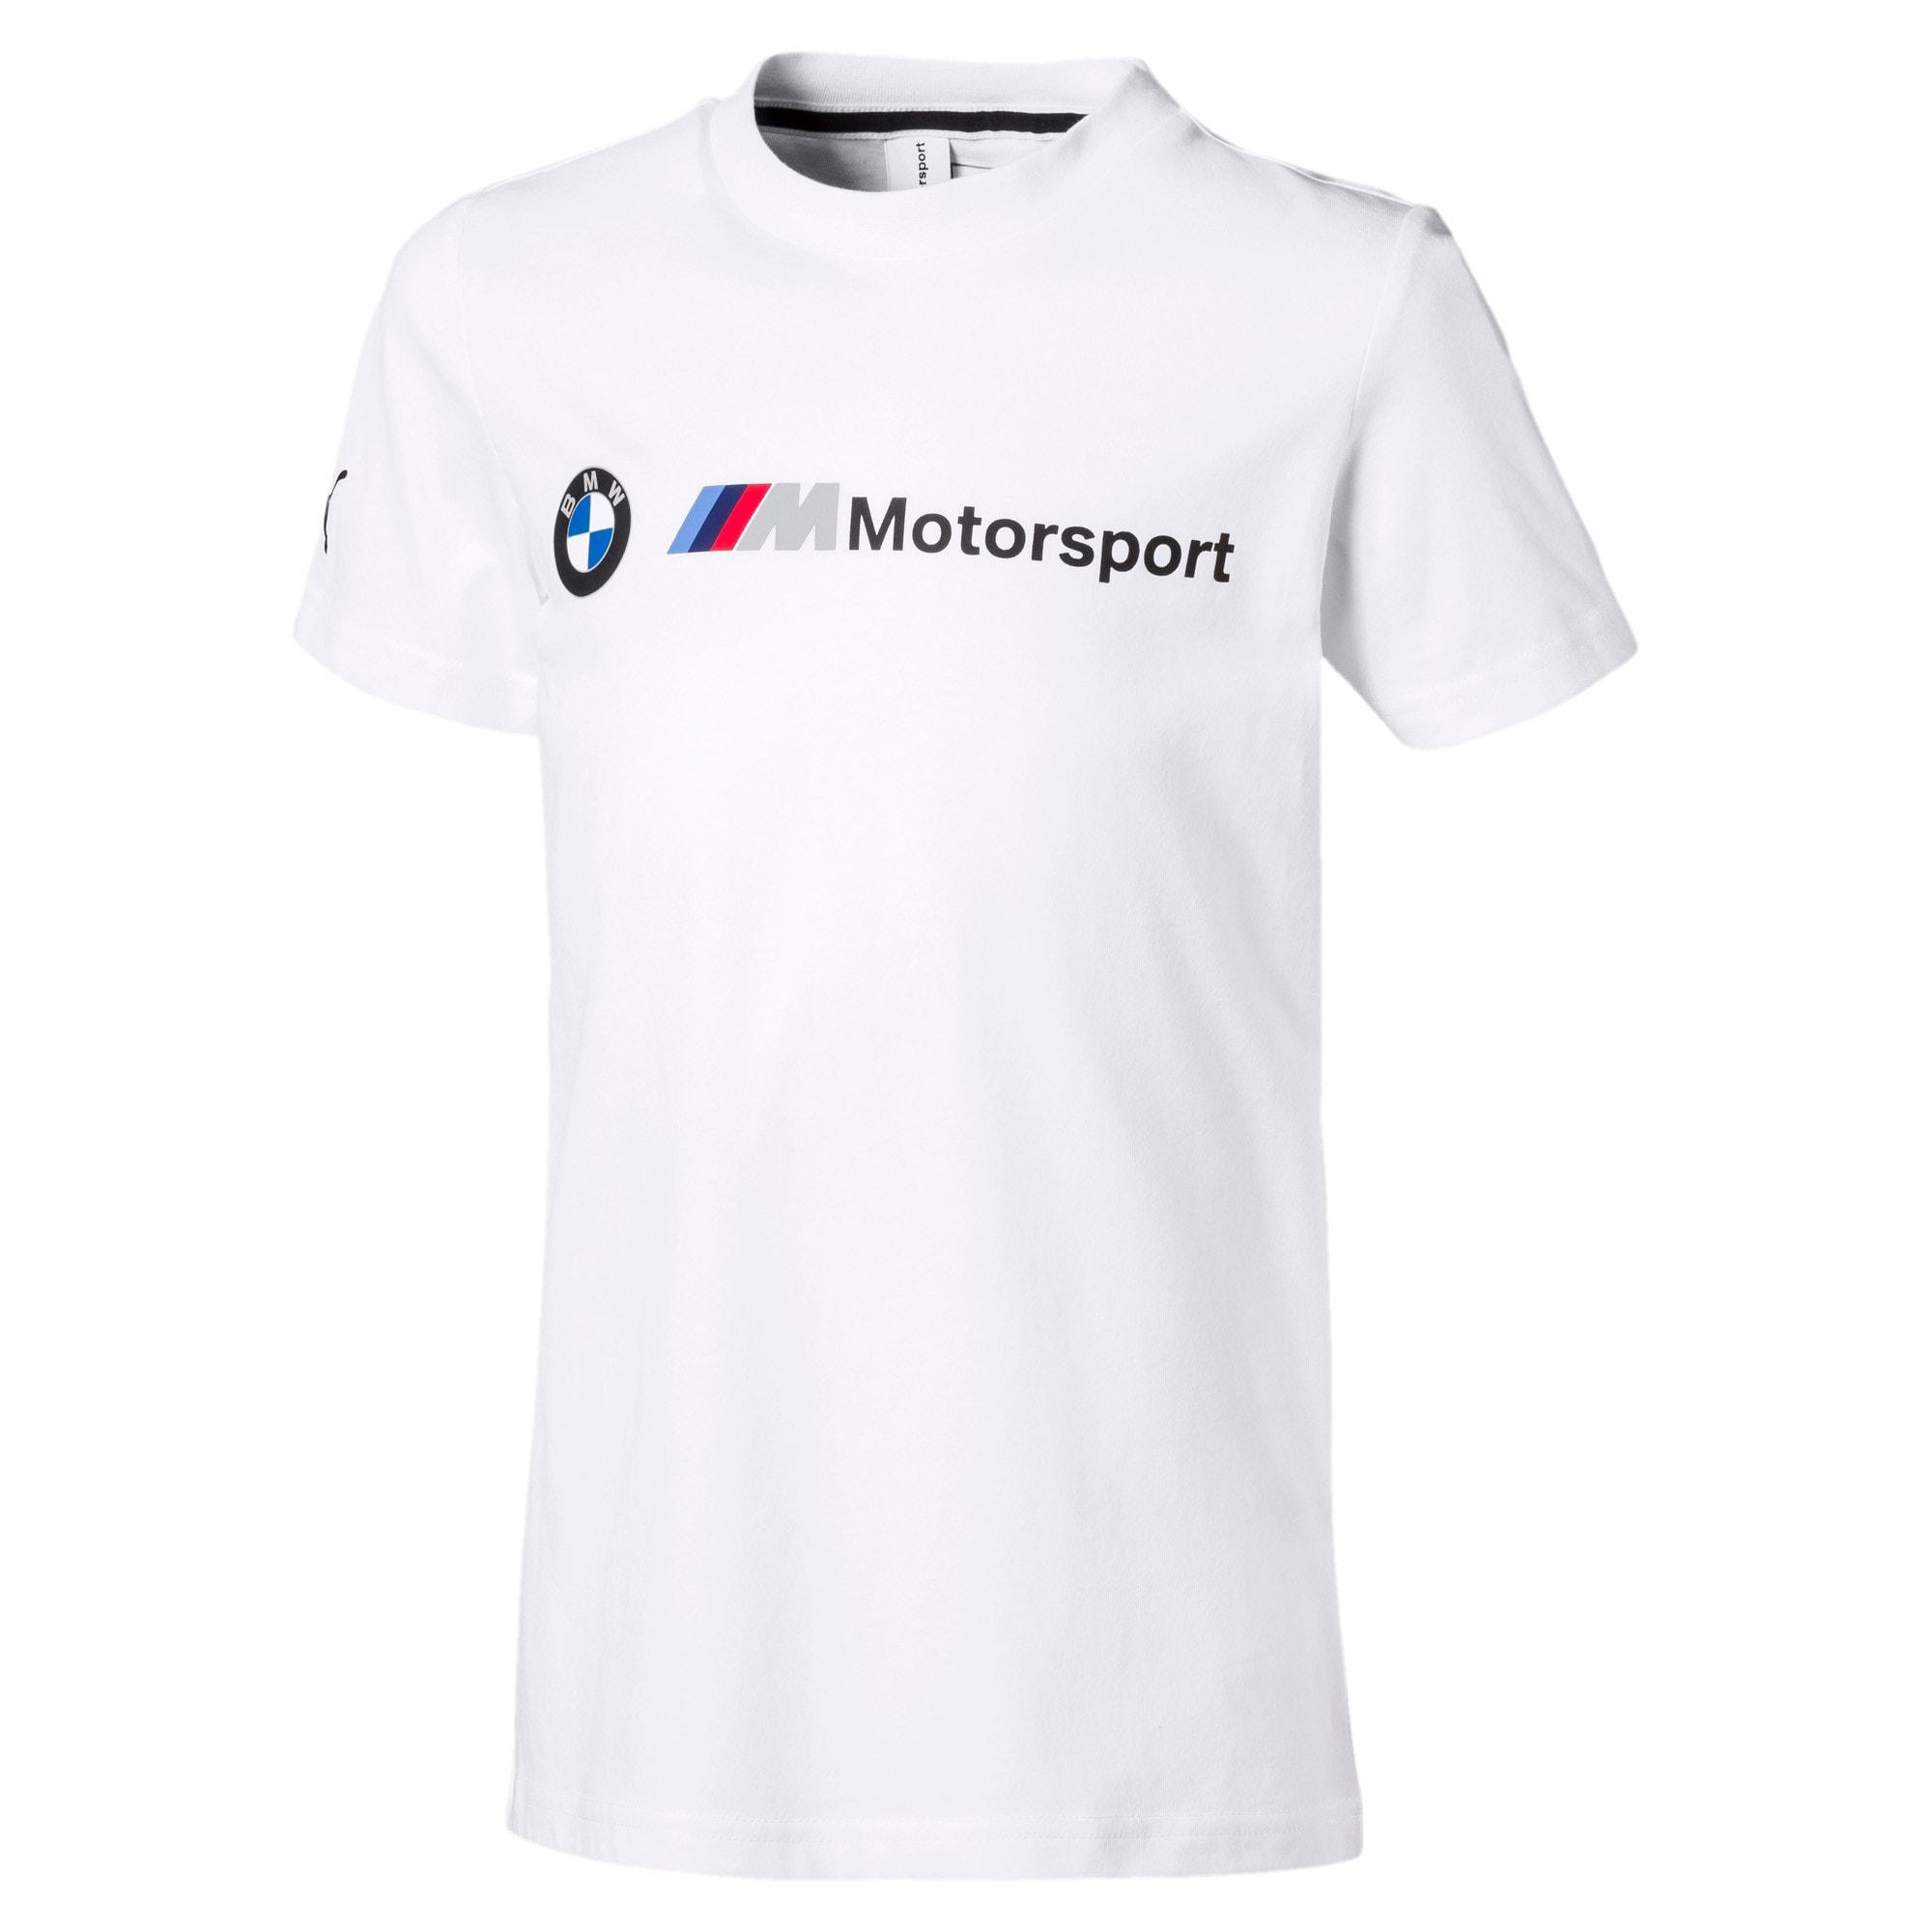 Miniatura 1 de Camiseta con logo BMW M Motorsport para niño joven, Puma White, mediano